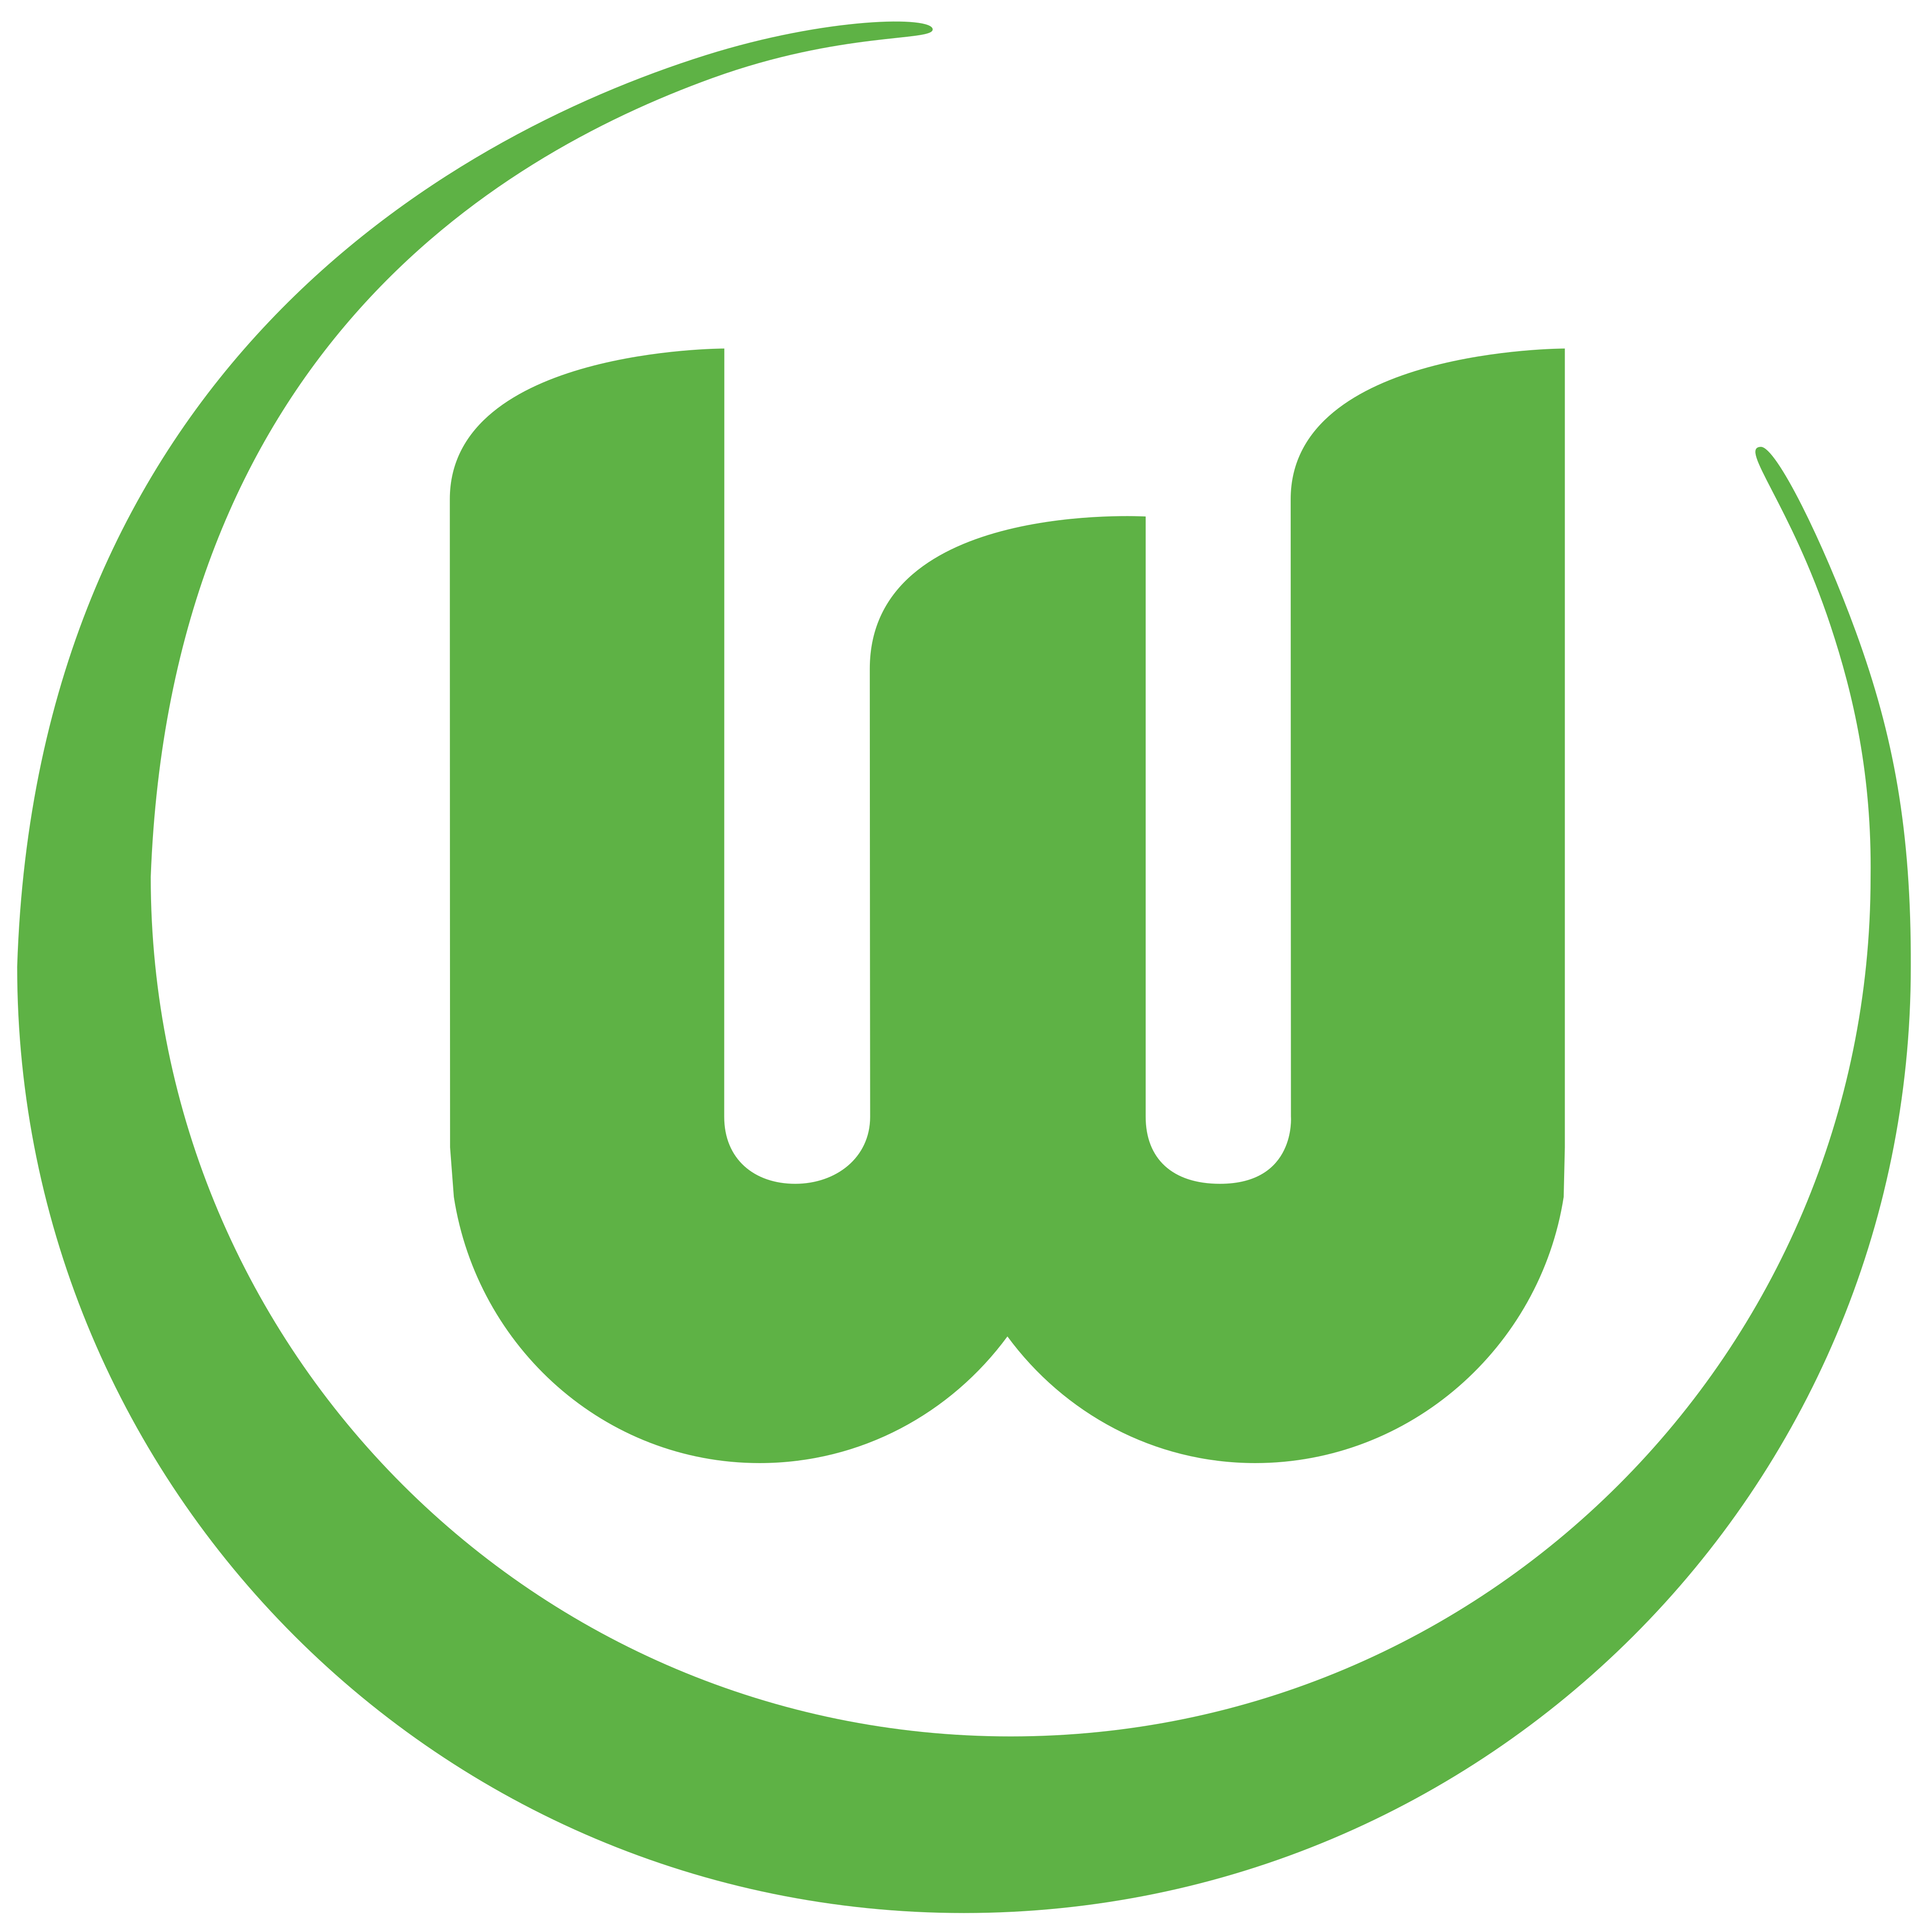 vfl wolfsburg logo - Wolfsburg Logo